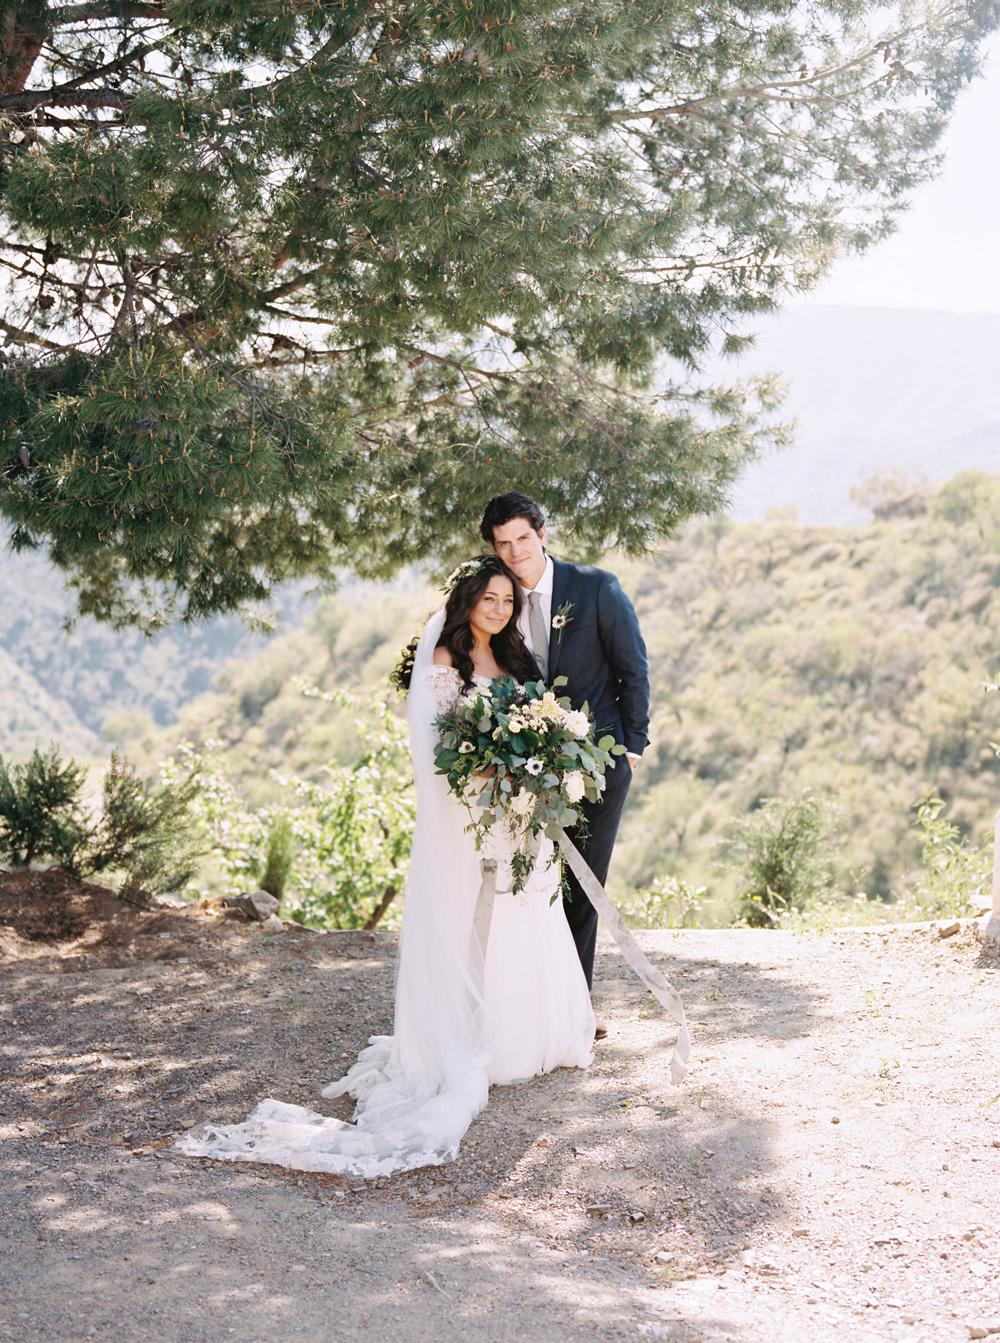 daphne jack wedding spain couple under tree